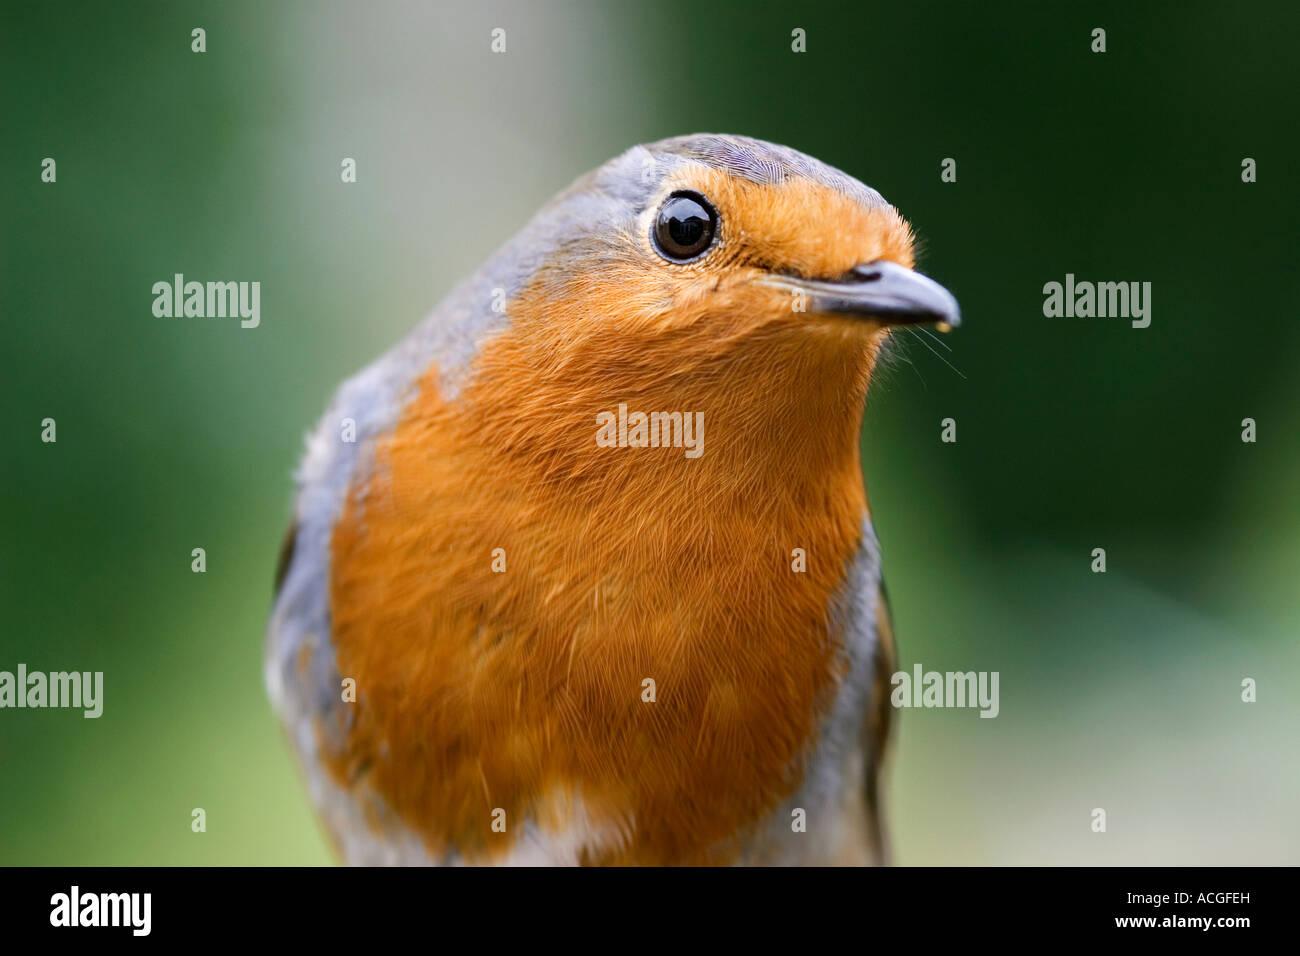 Robin redbreast close up - Stock Image